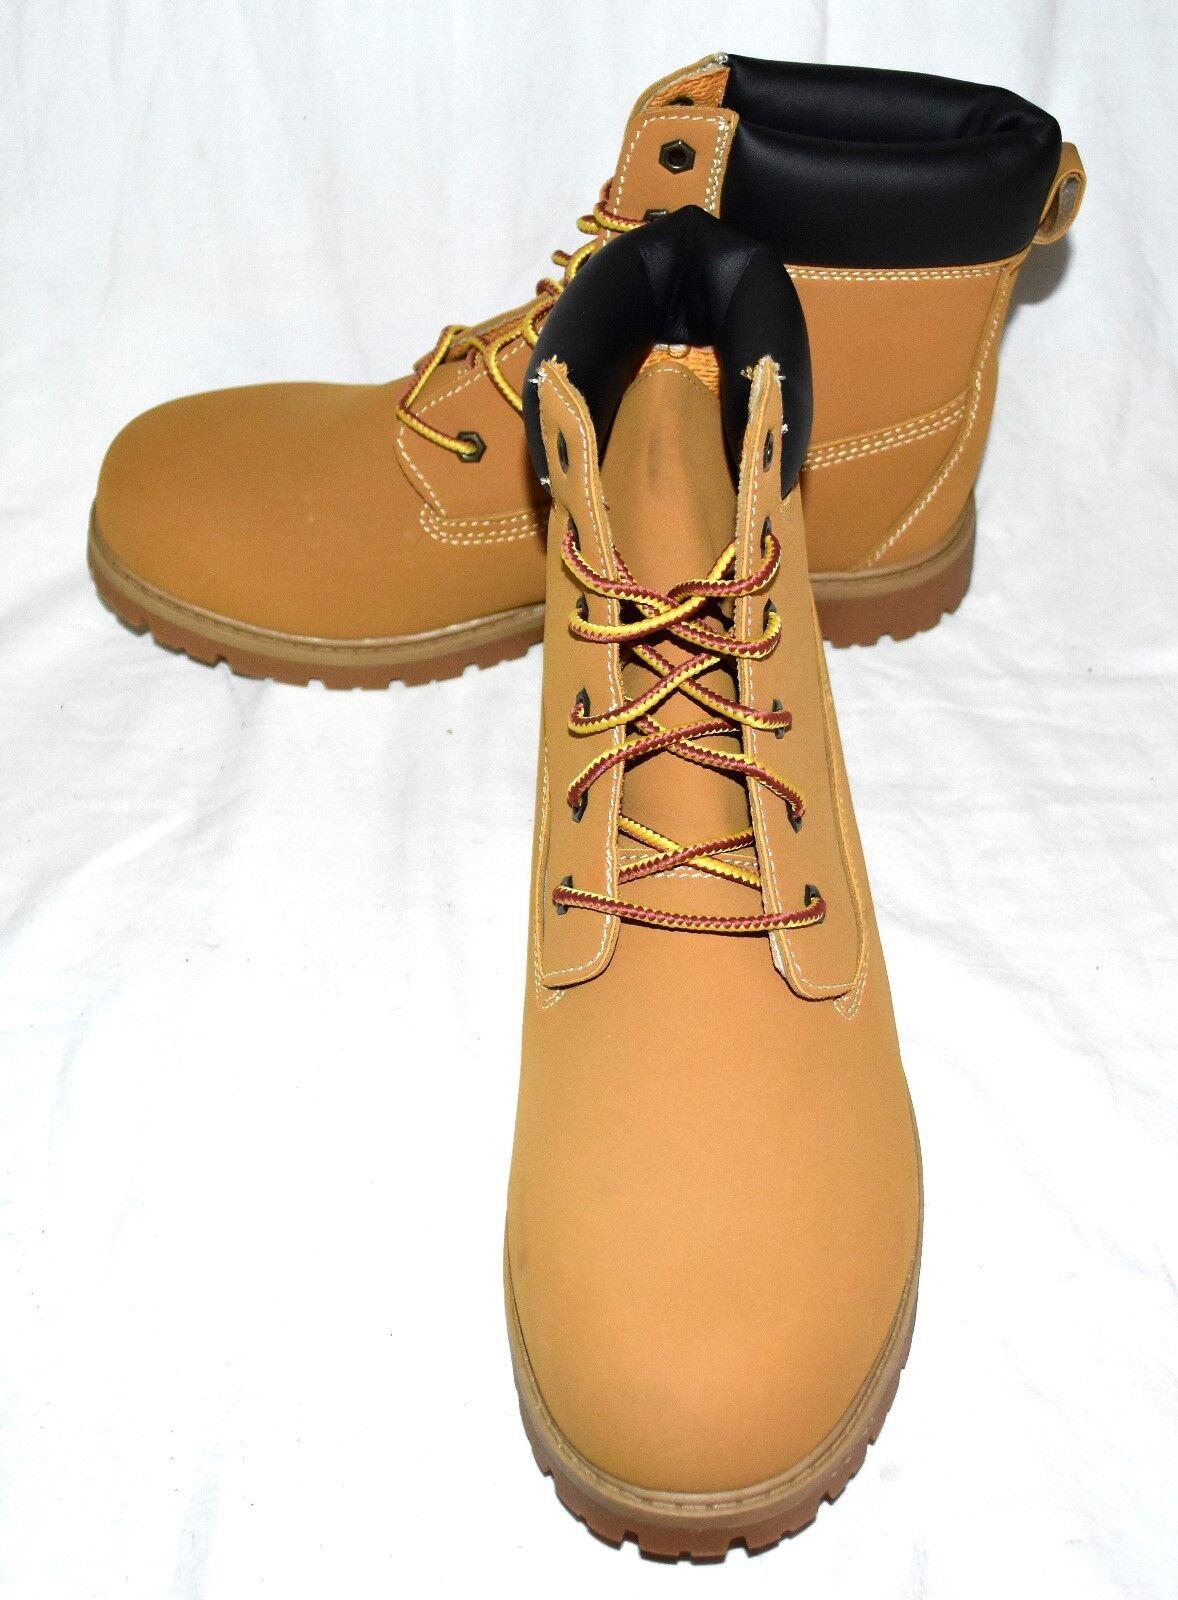 Ozark Trails Brown Faux Leather Mens Work Fashion Dress Hi Top Boots Size 13